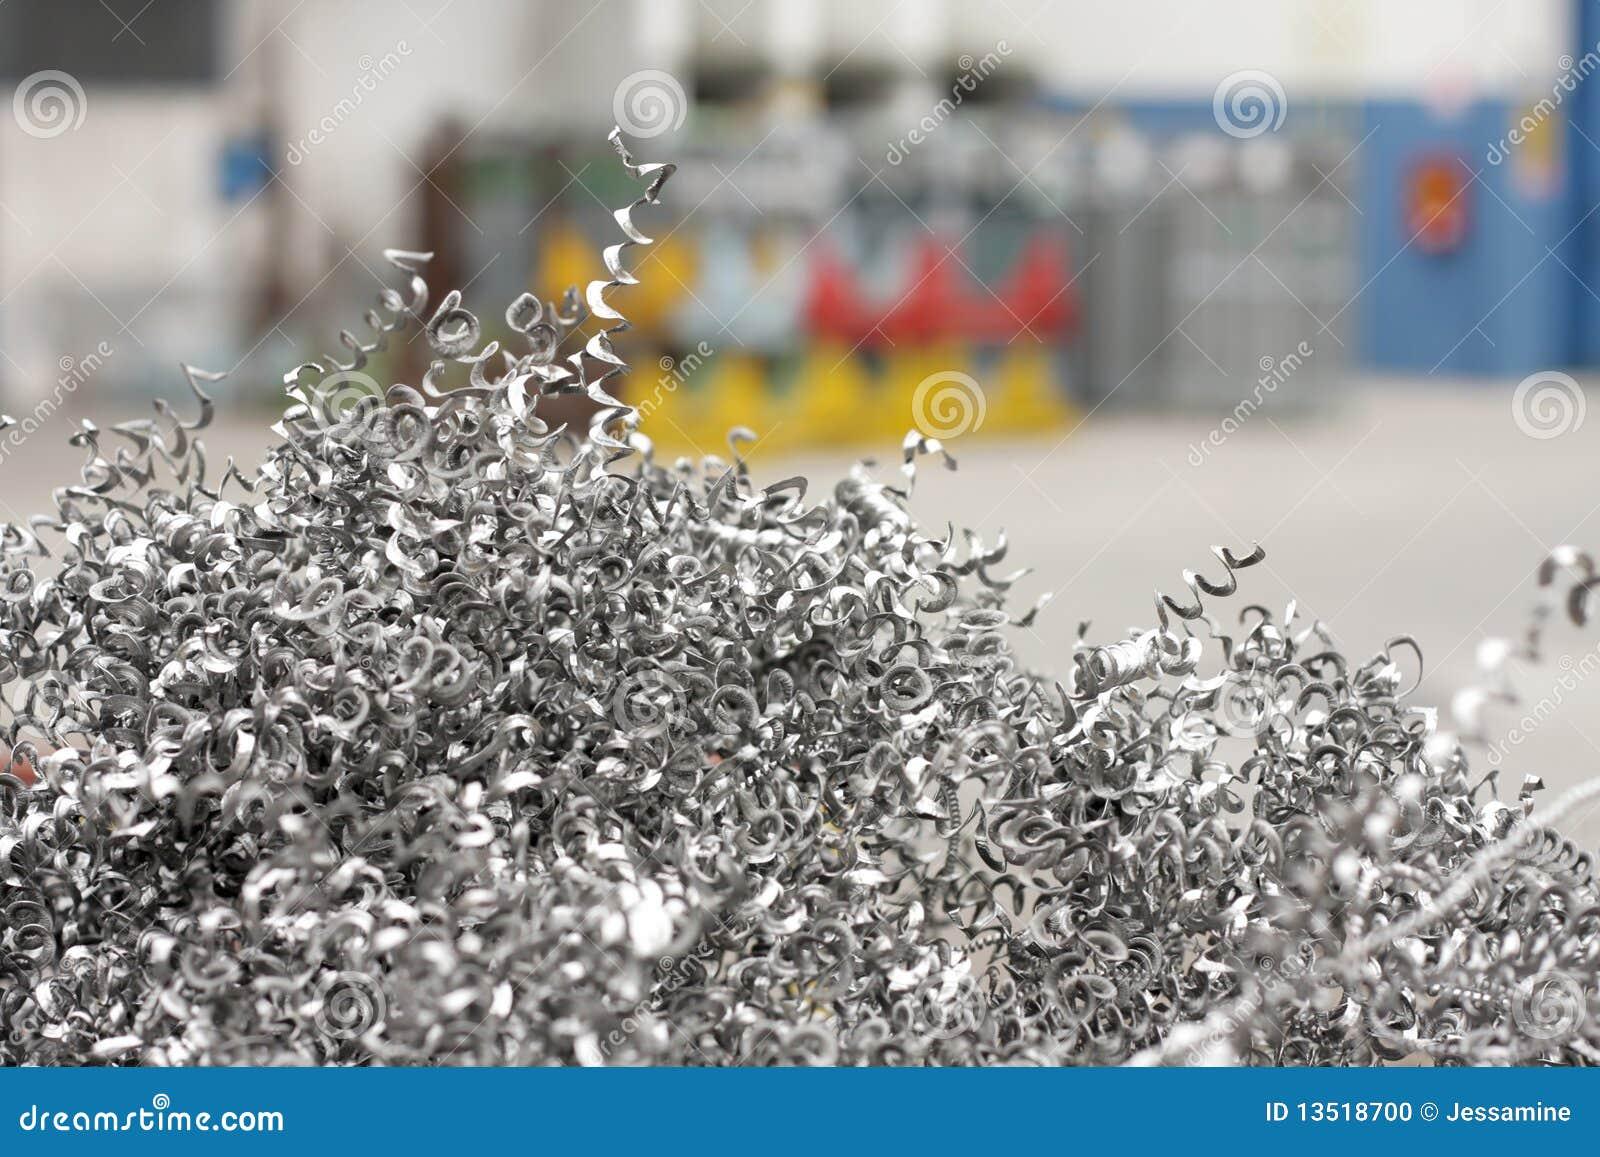 Metal Chips Stock Photo Image 13518700